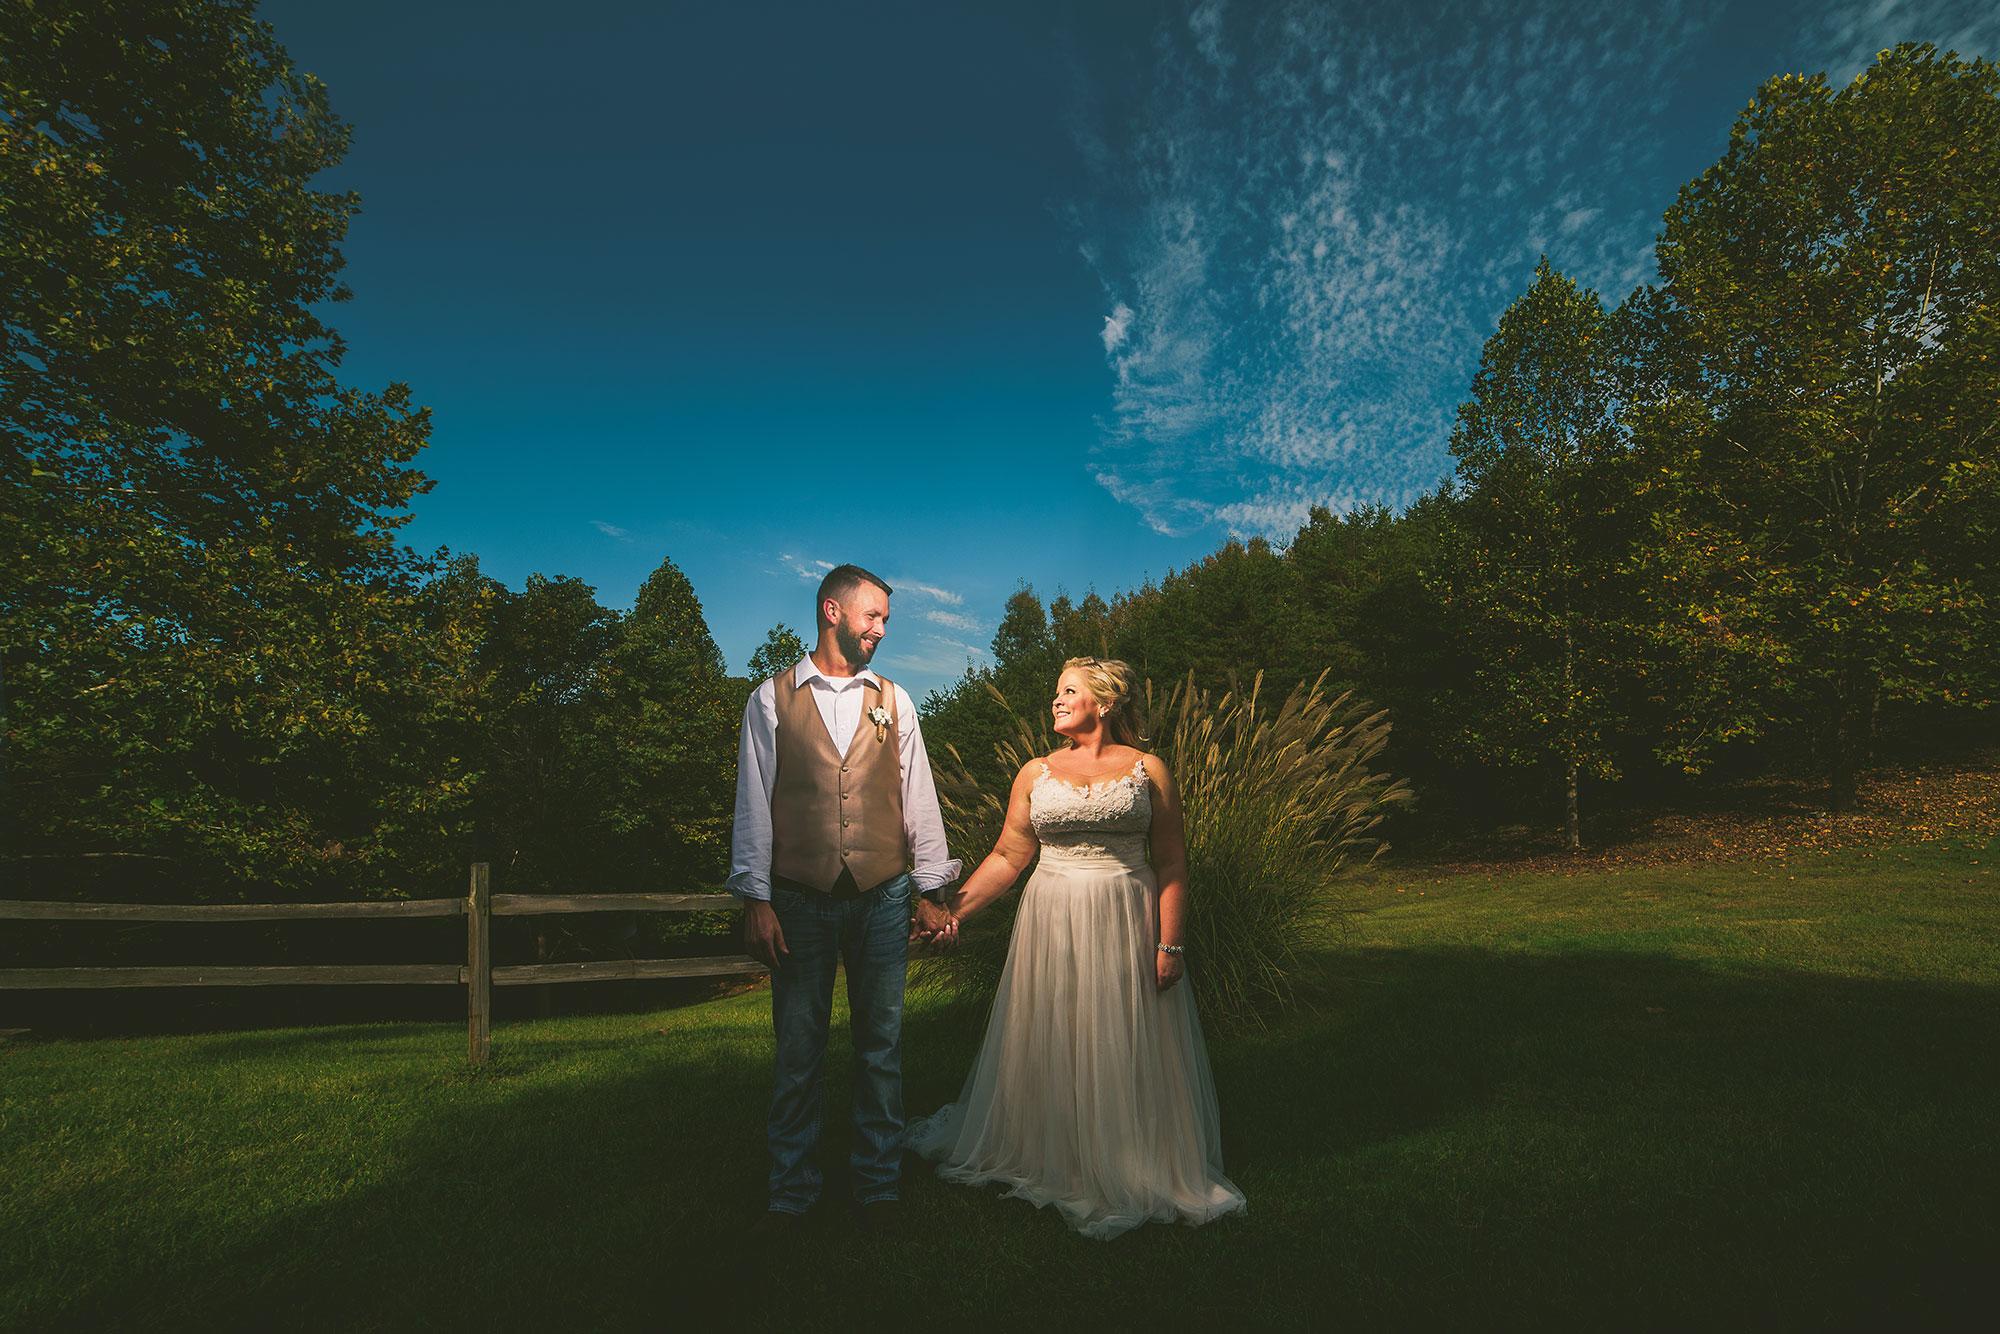 2017-09-24-Meagon-Jeremy-Wedding-1783.jpg